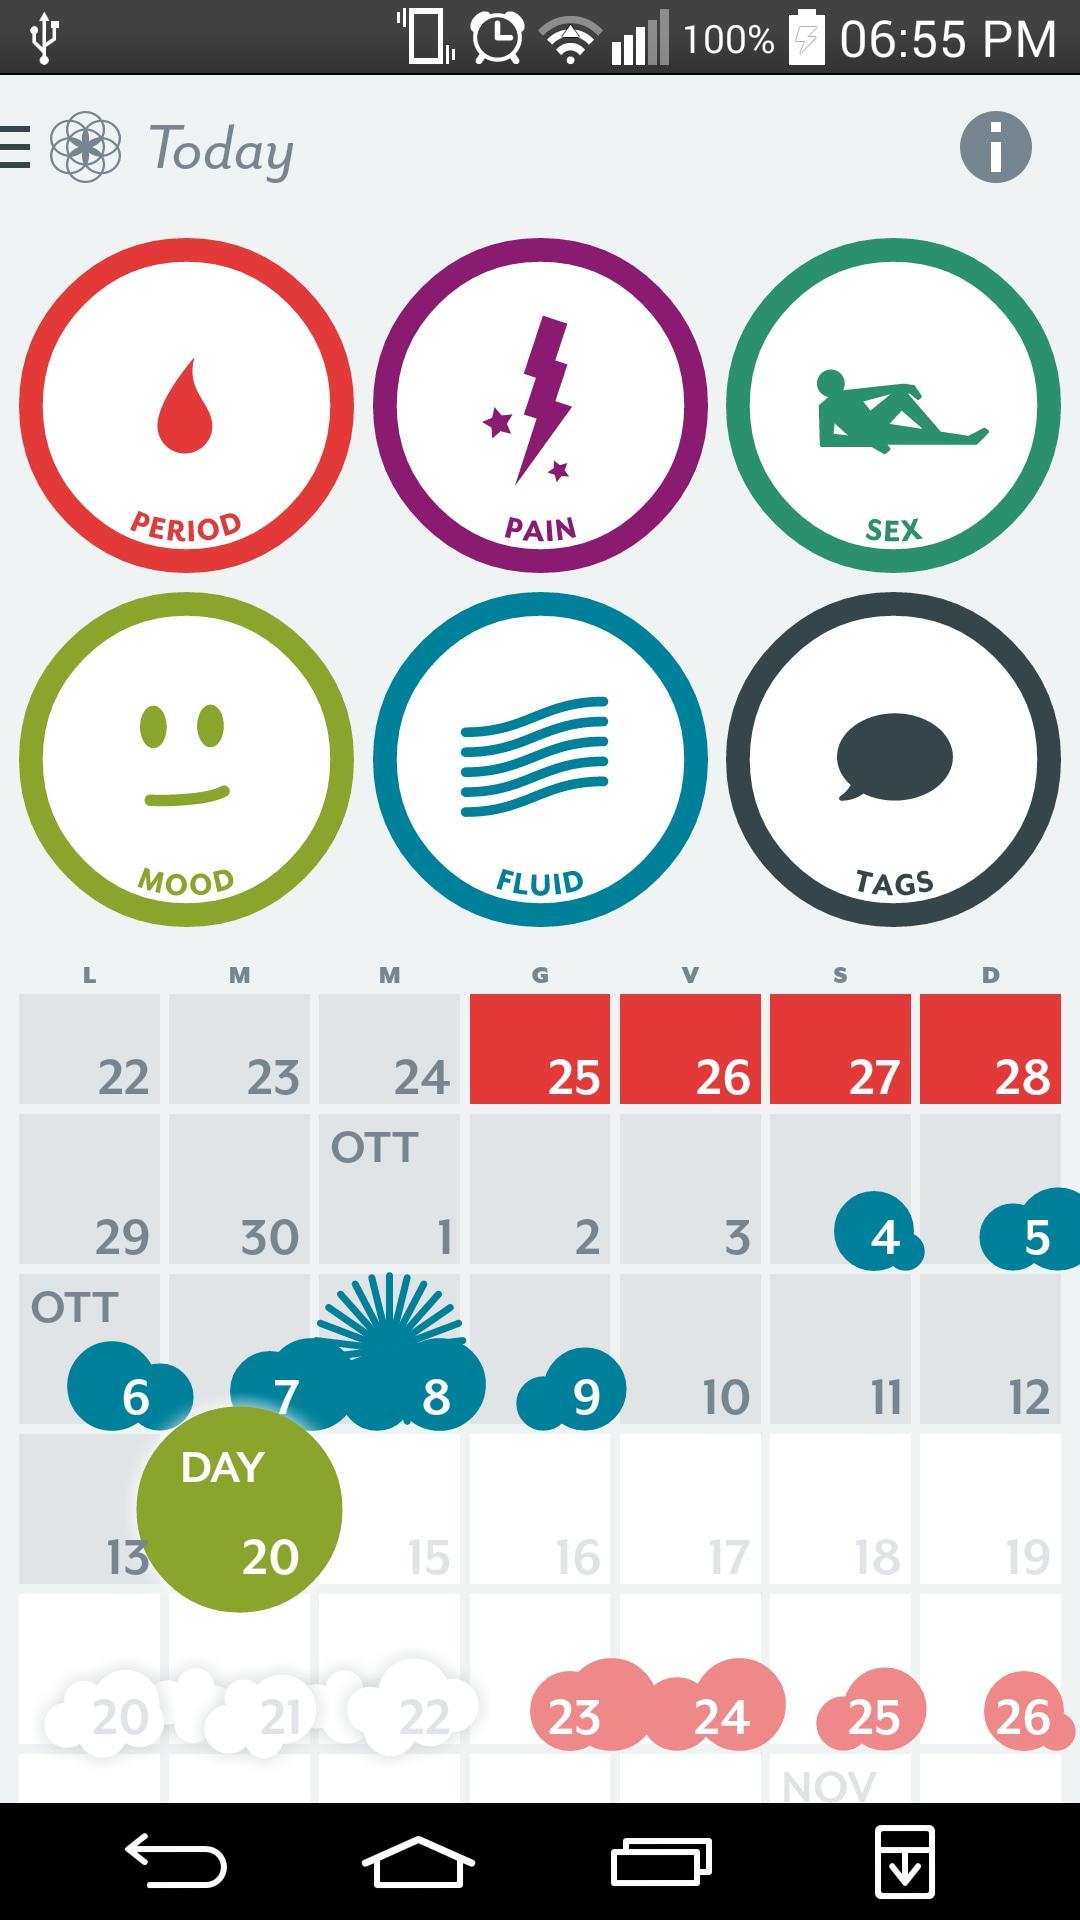 Calendario Del Ciclo Mestruale.Un Calendario Per Controllare Il Ciclo Mestruale Con L App